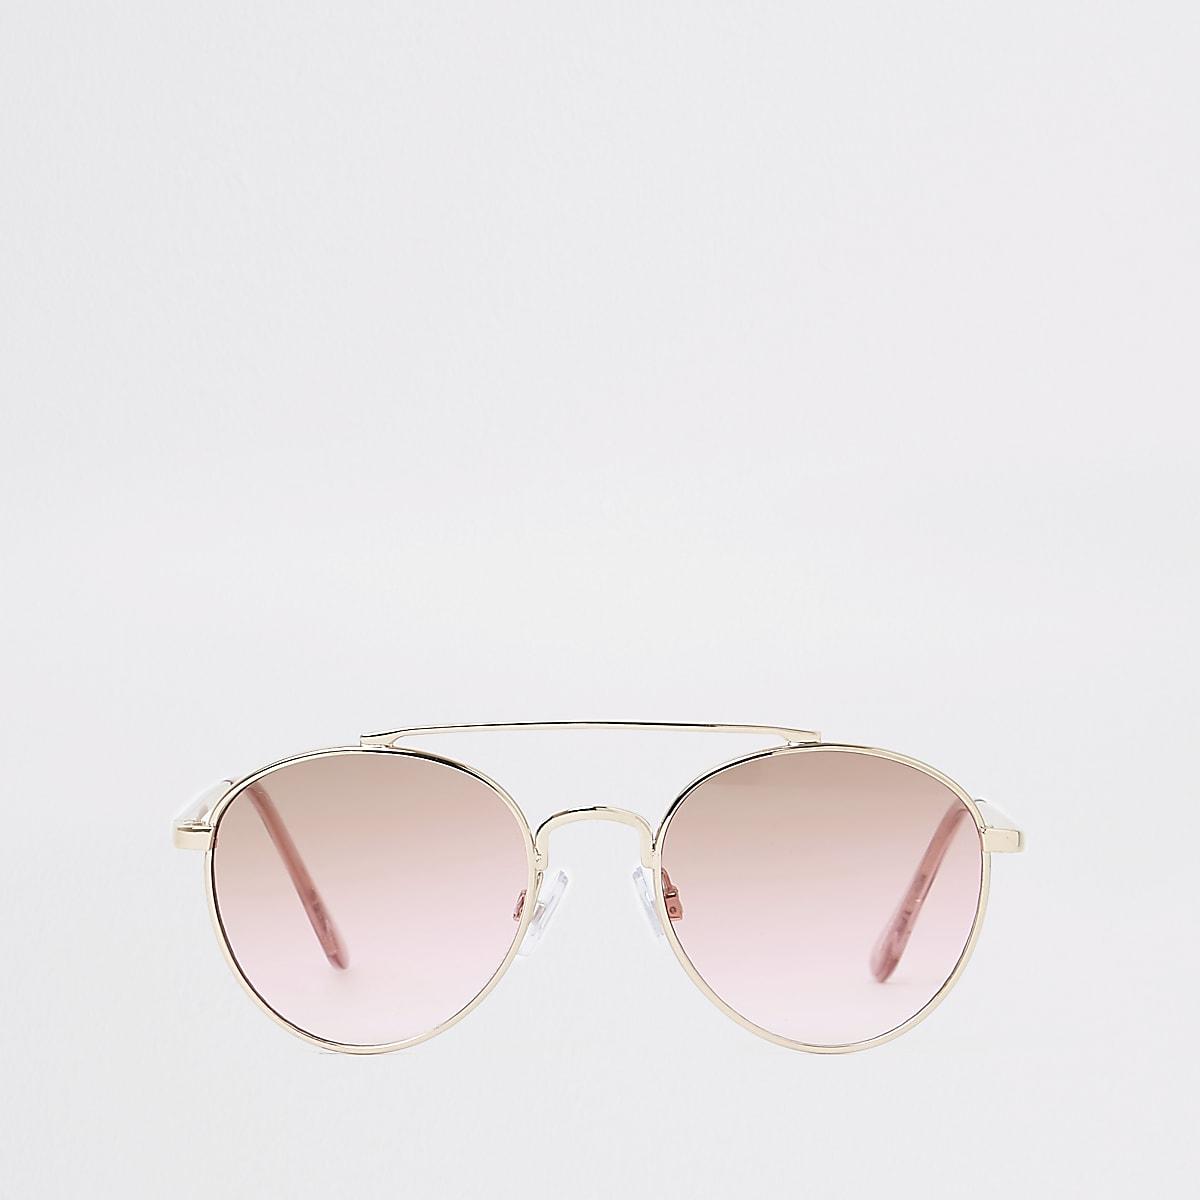 Girls gold pink lens aviator sunglasses